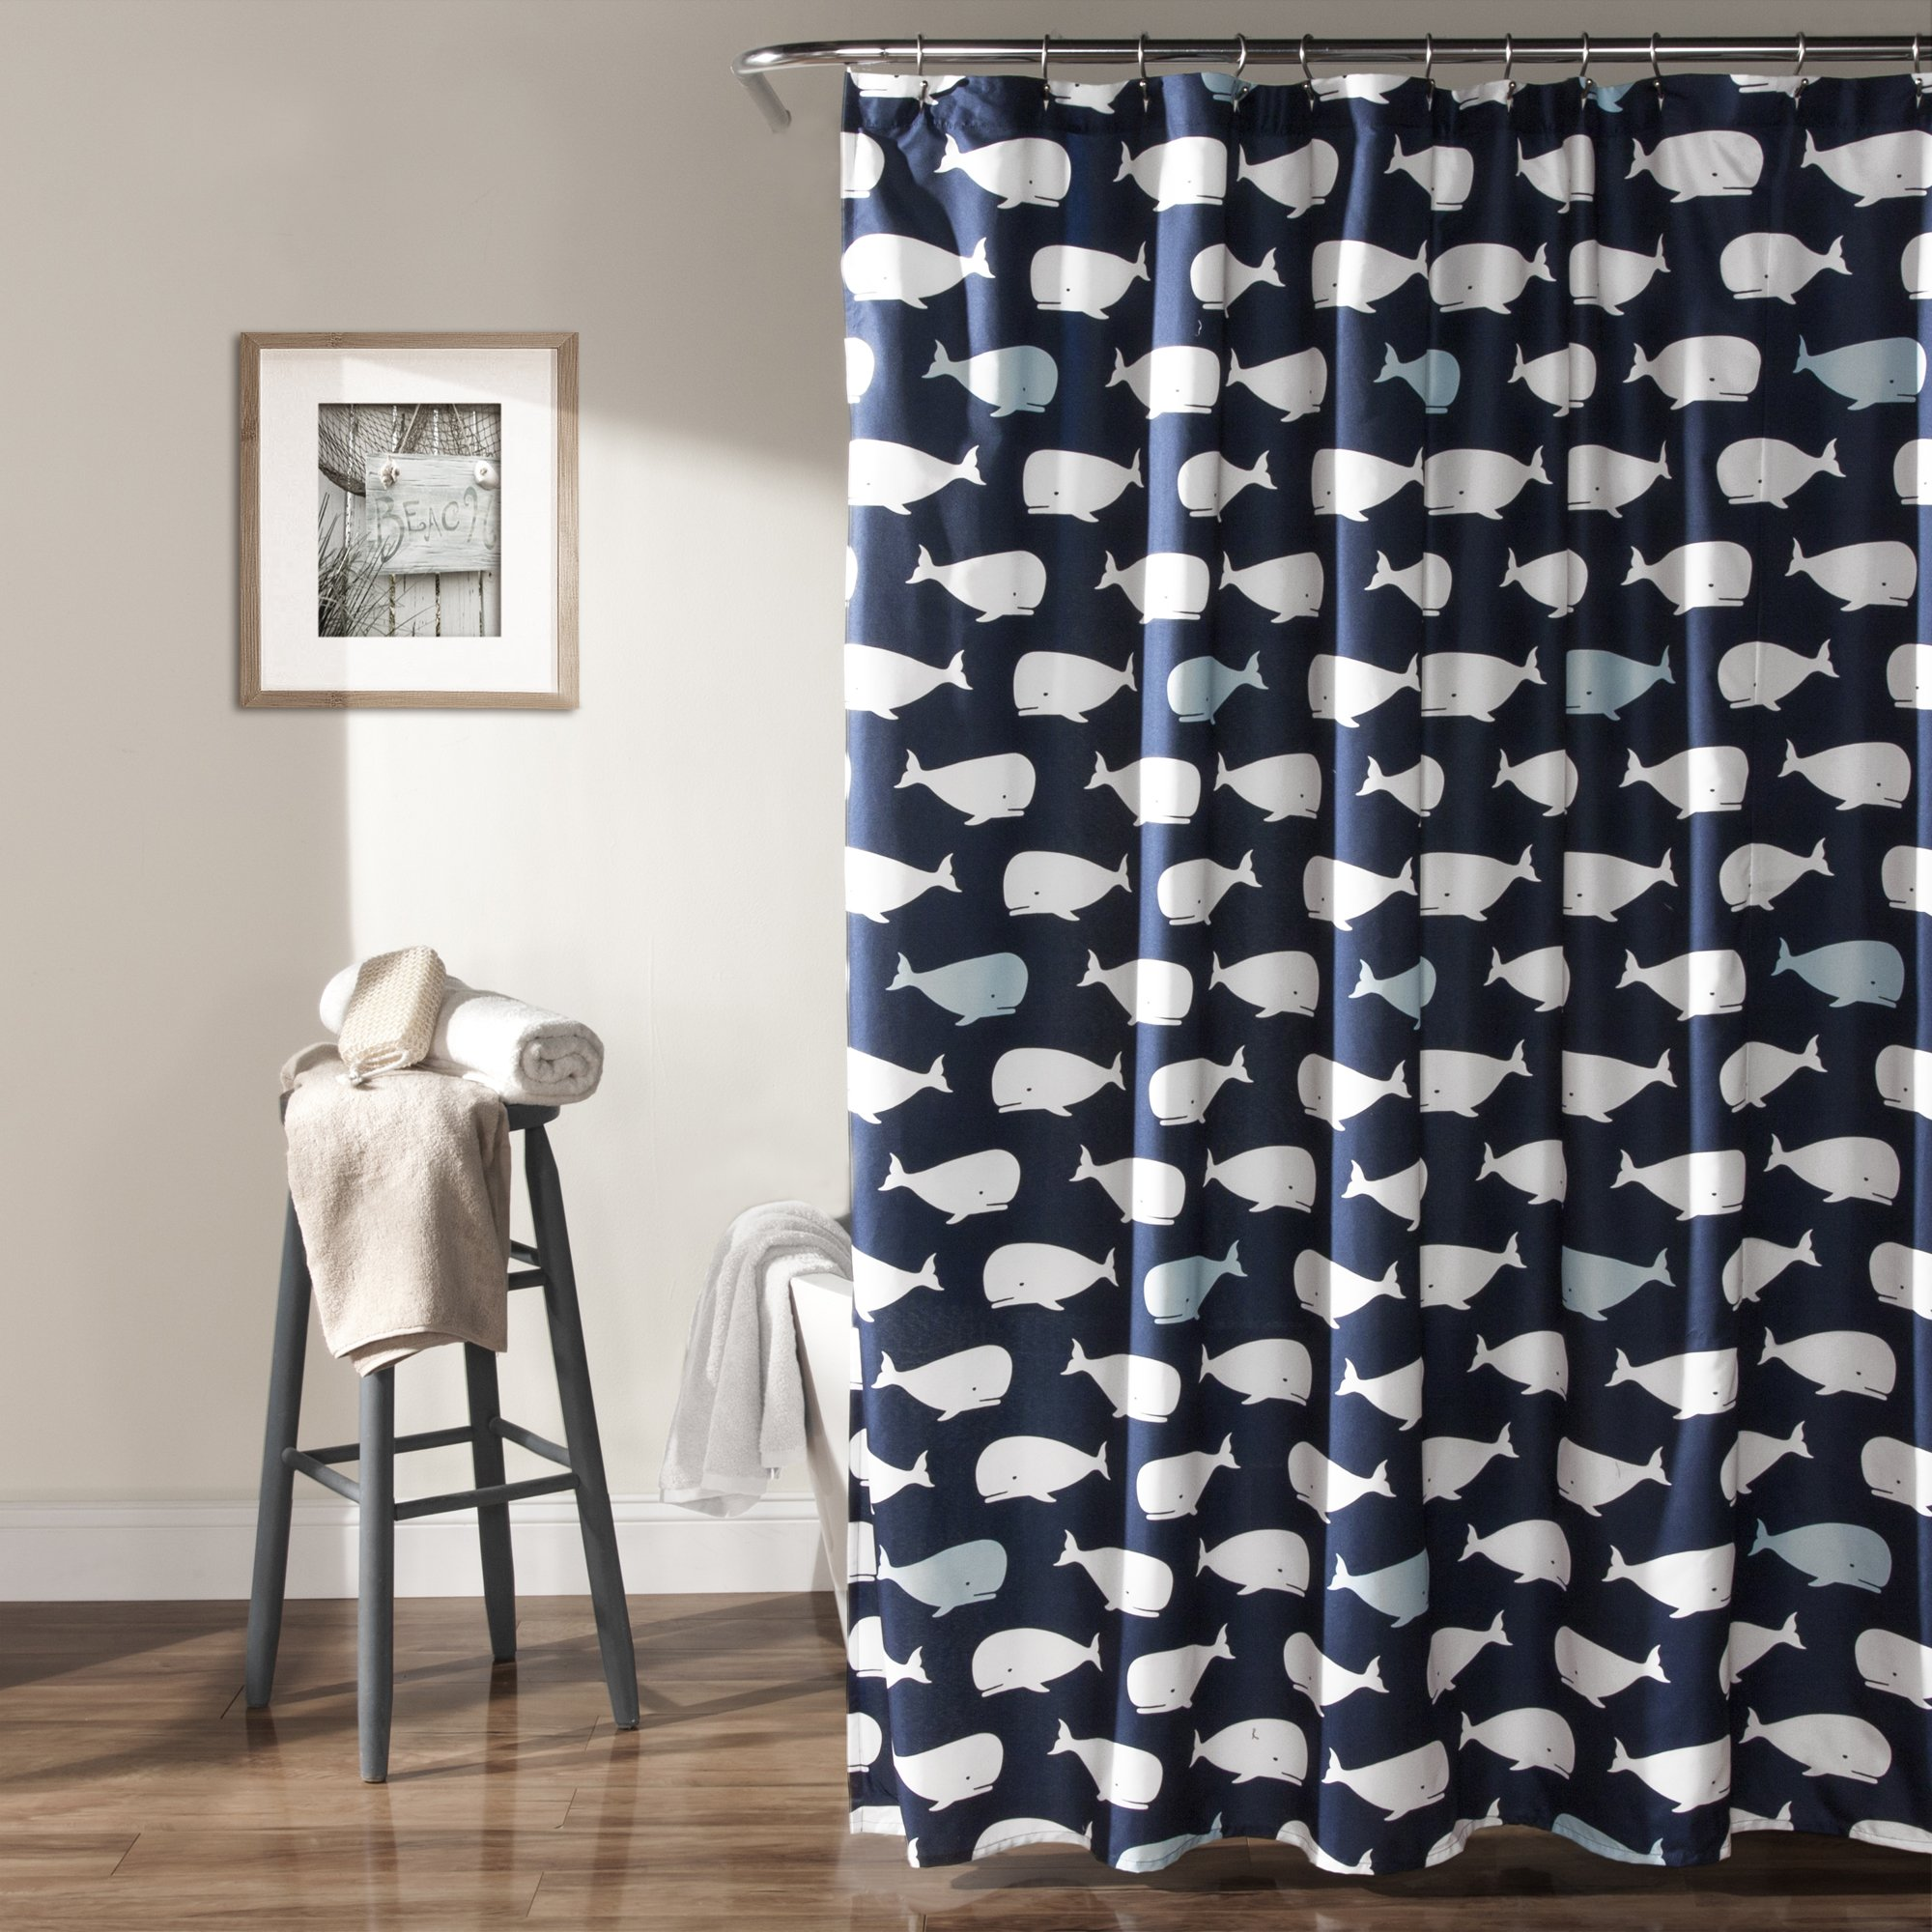 Lush Decor Whale Shower Curtain, 72'' x 72'', Navy